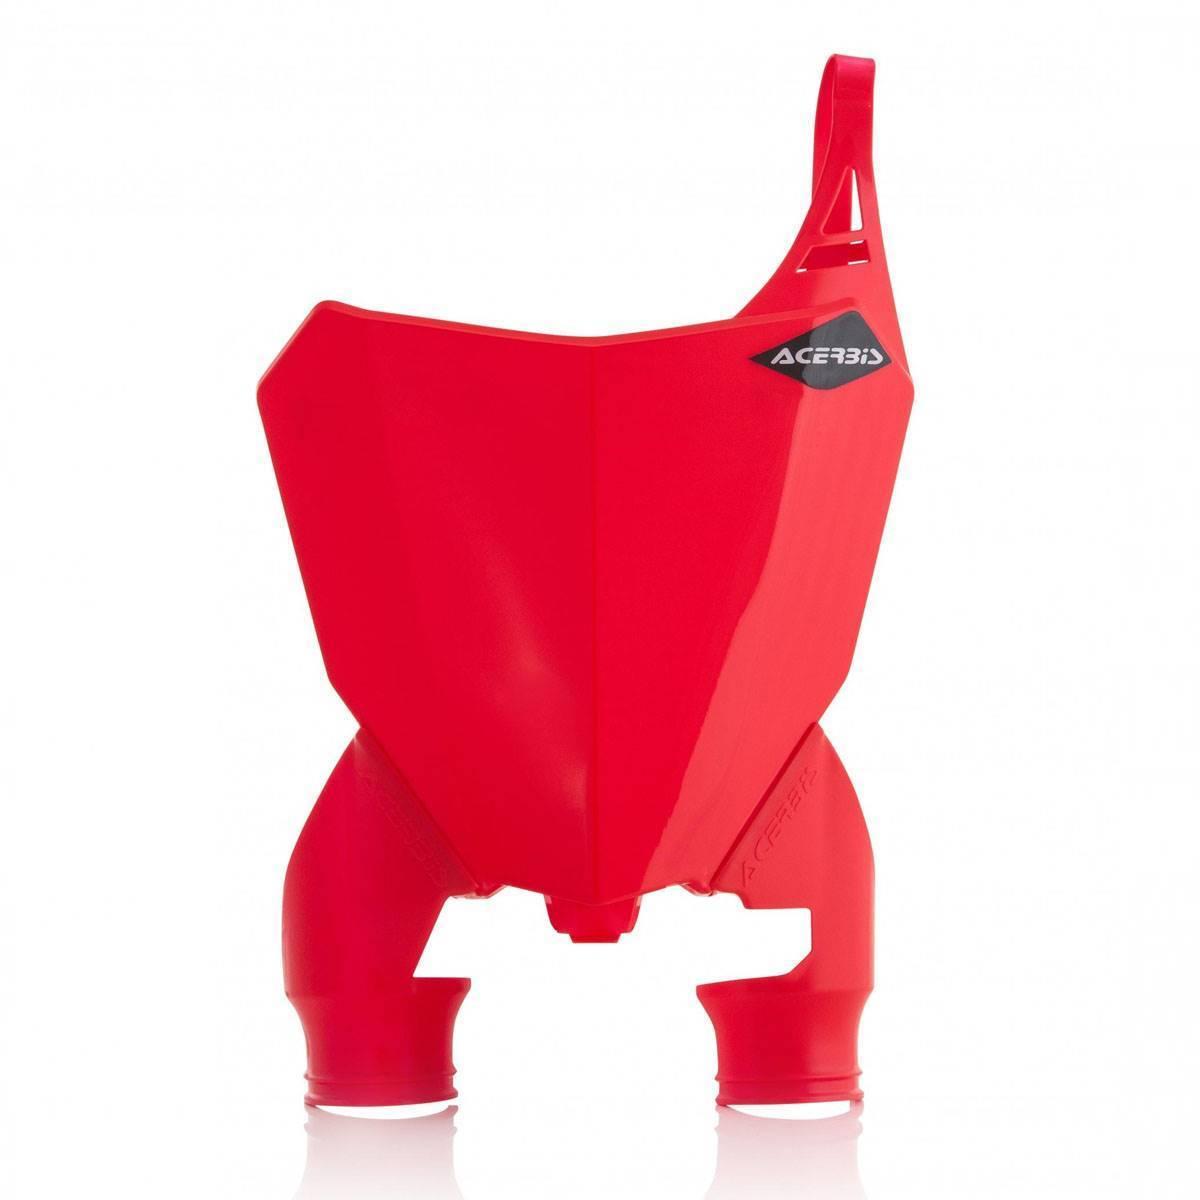 0022391-343 - Portanumero Delantero Raptor Crf250 18. 450 17 18 Rojo Blanco